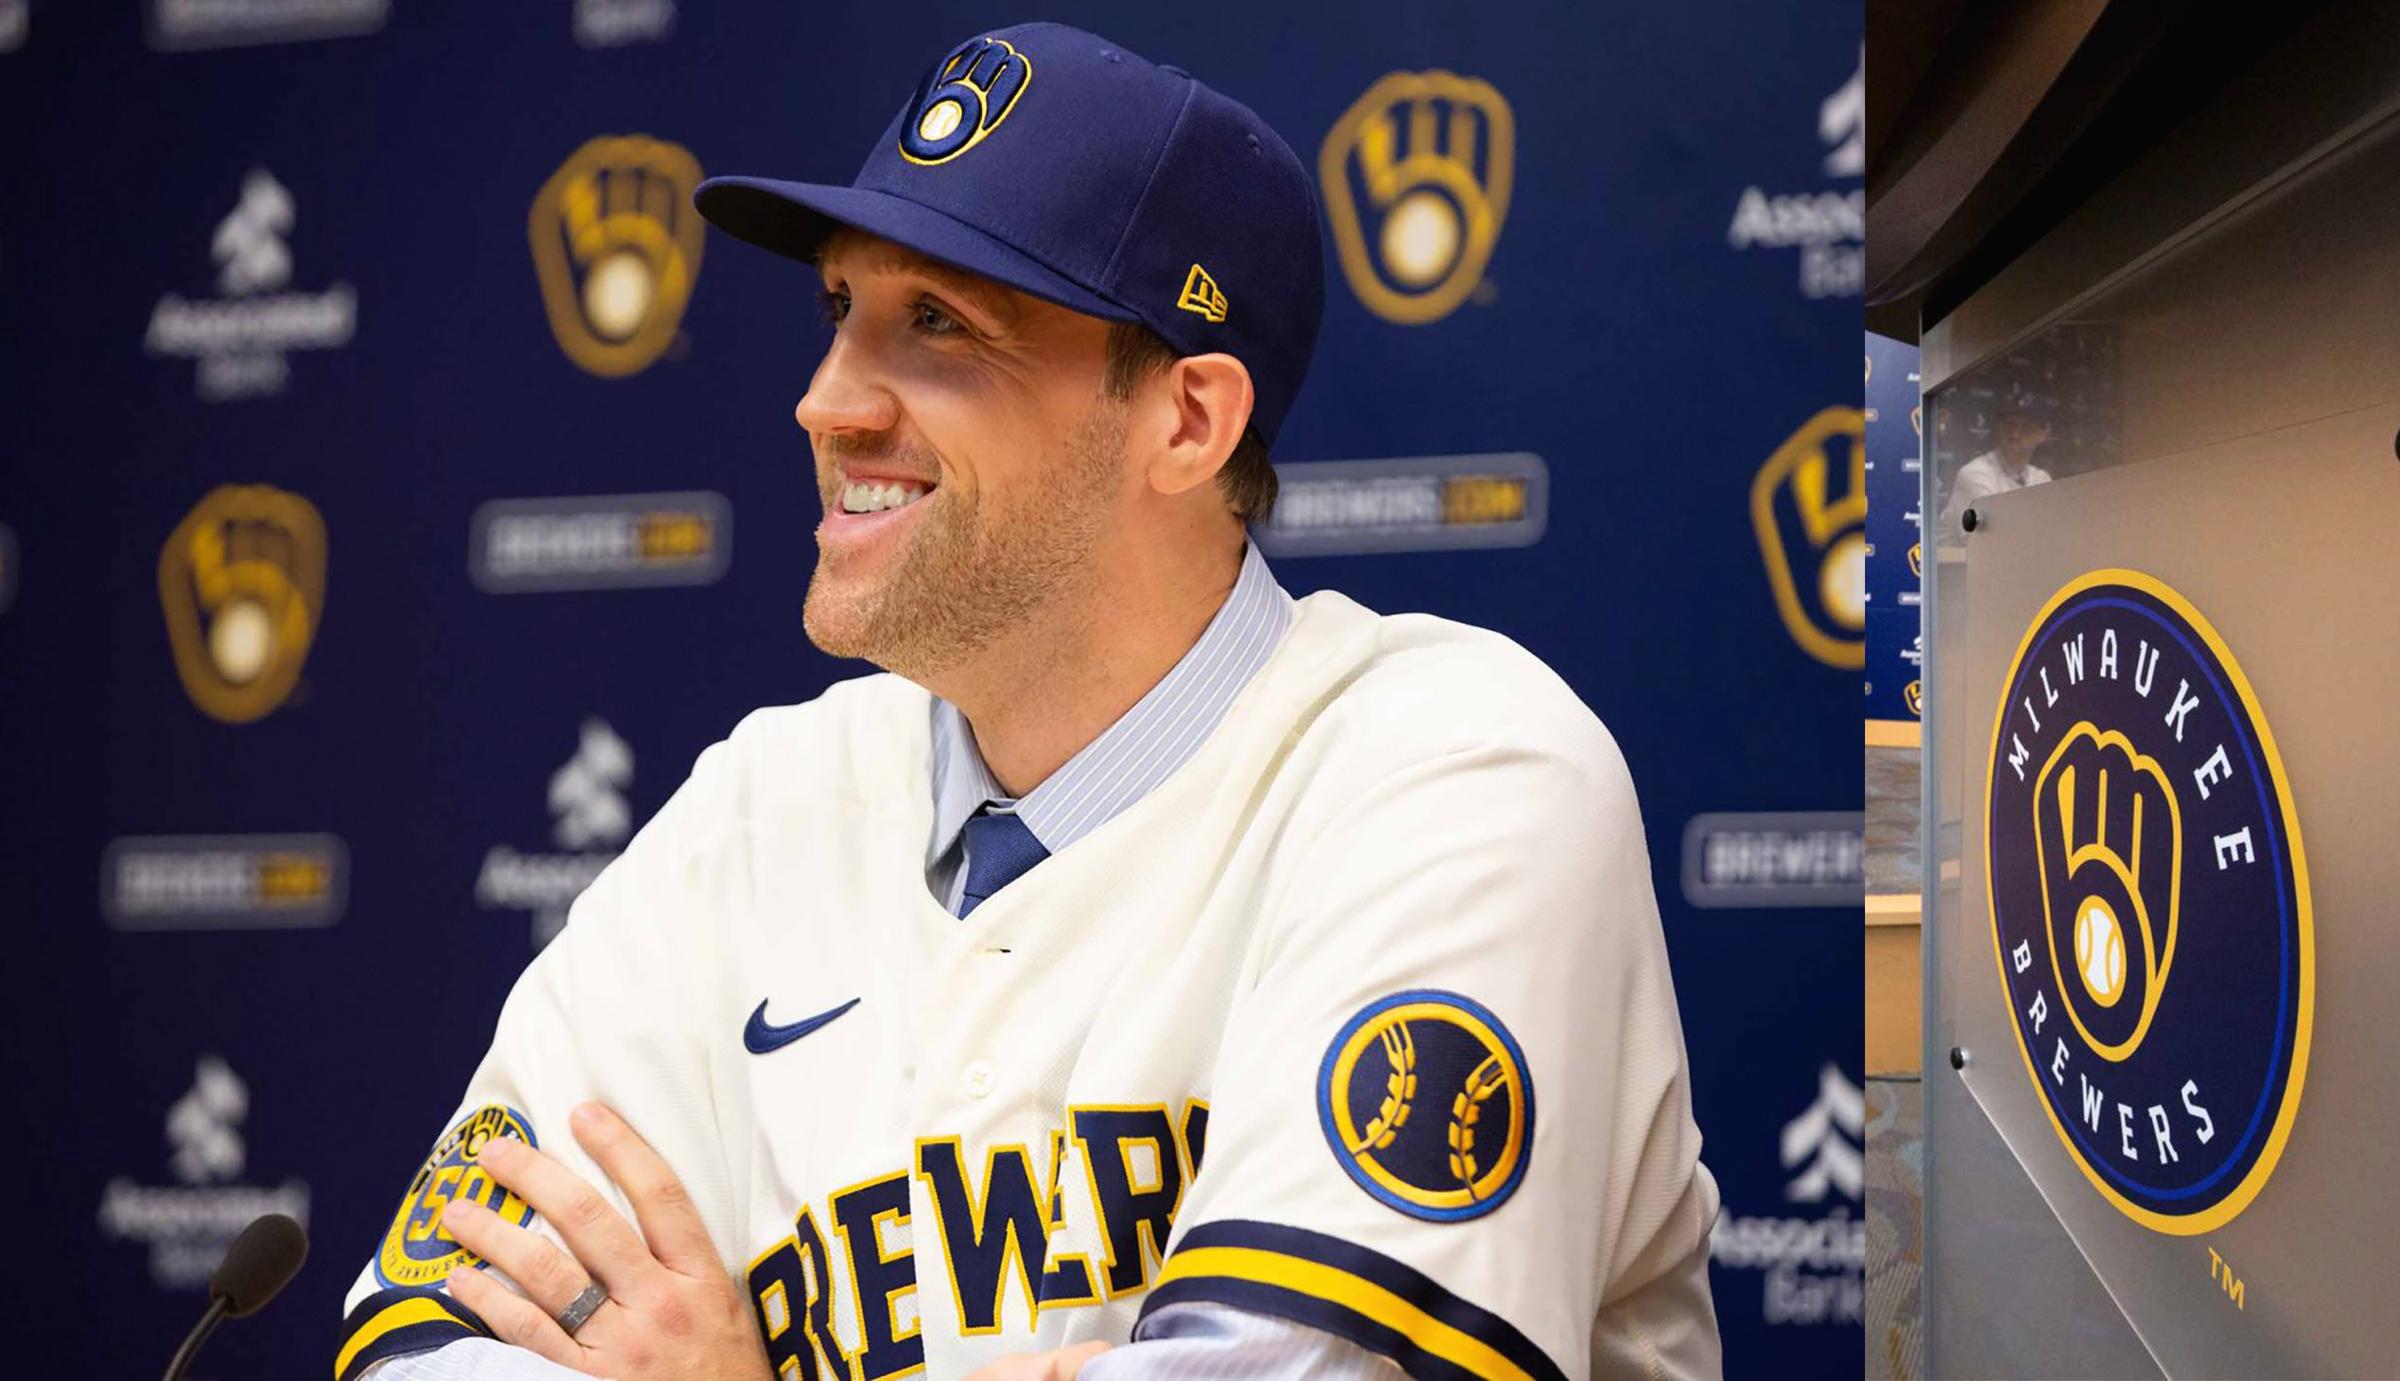 Josh Lindblom Podium New Brewers Uniform